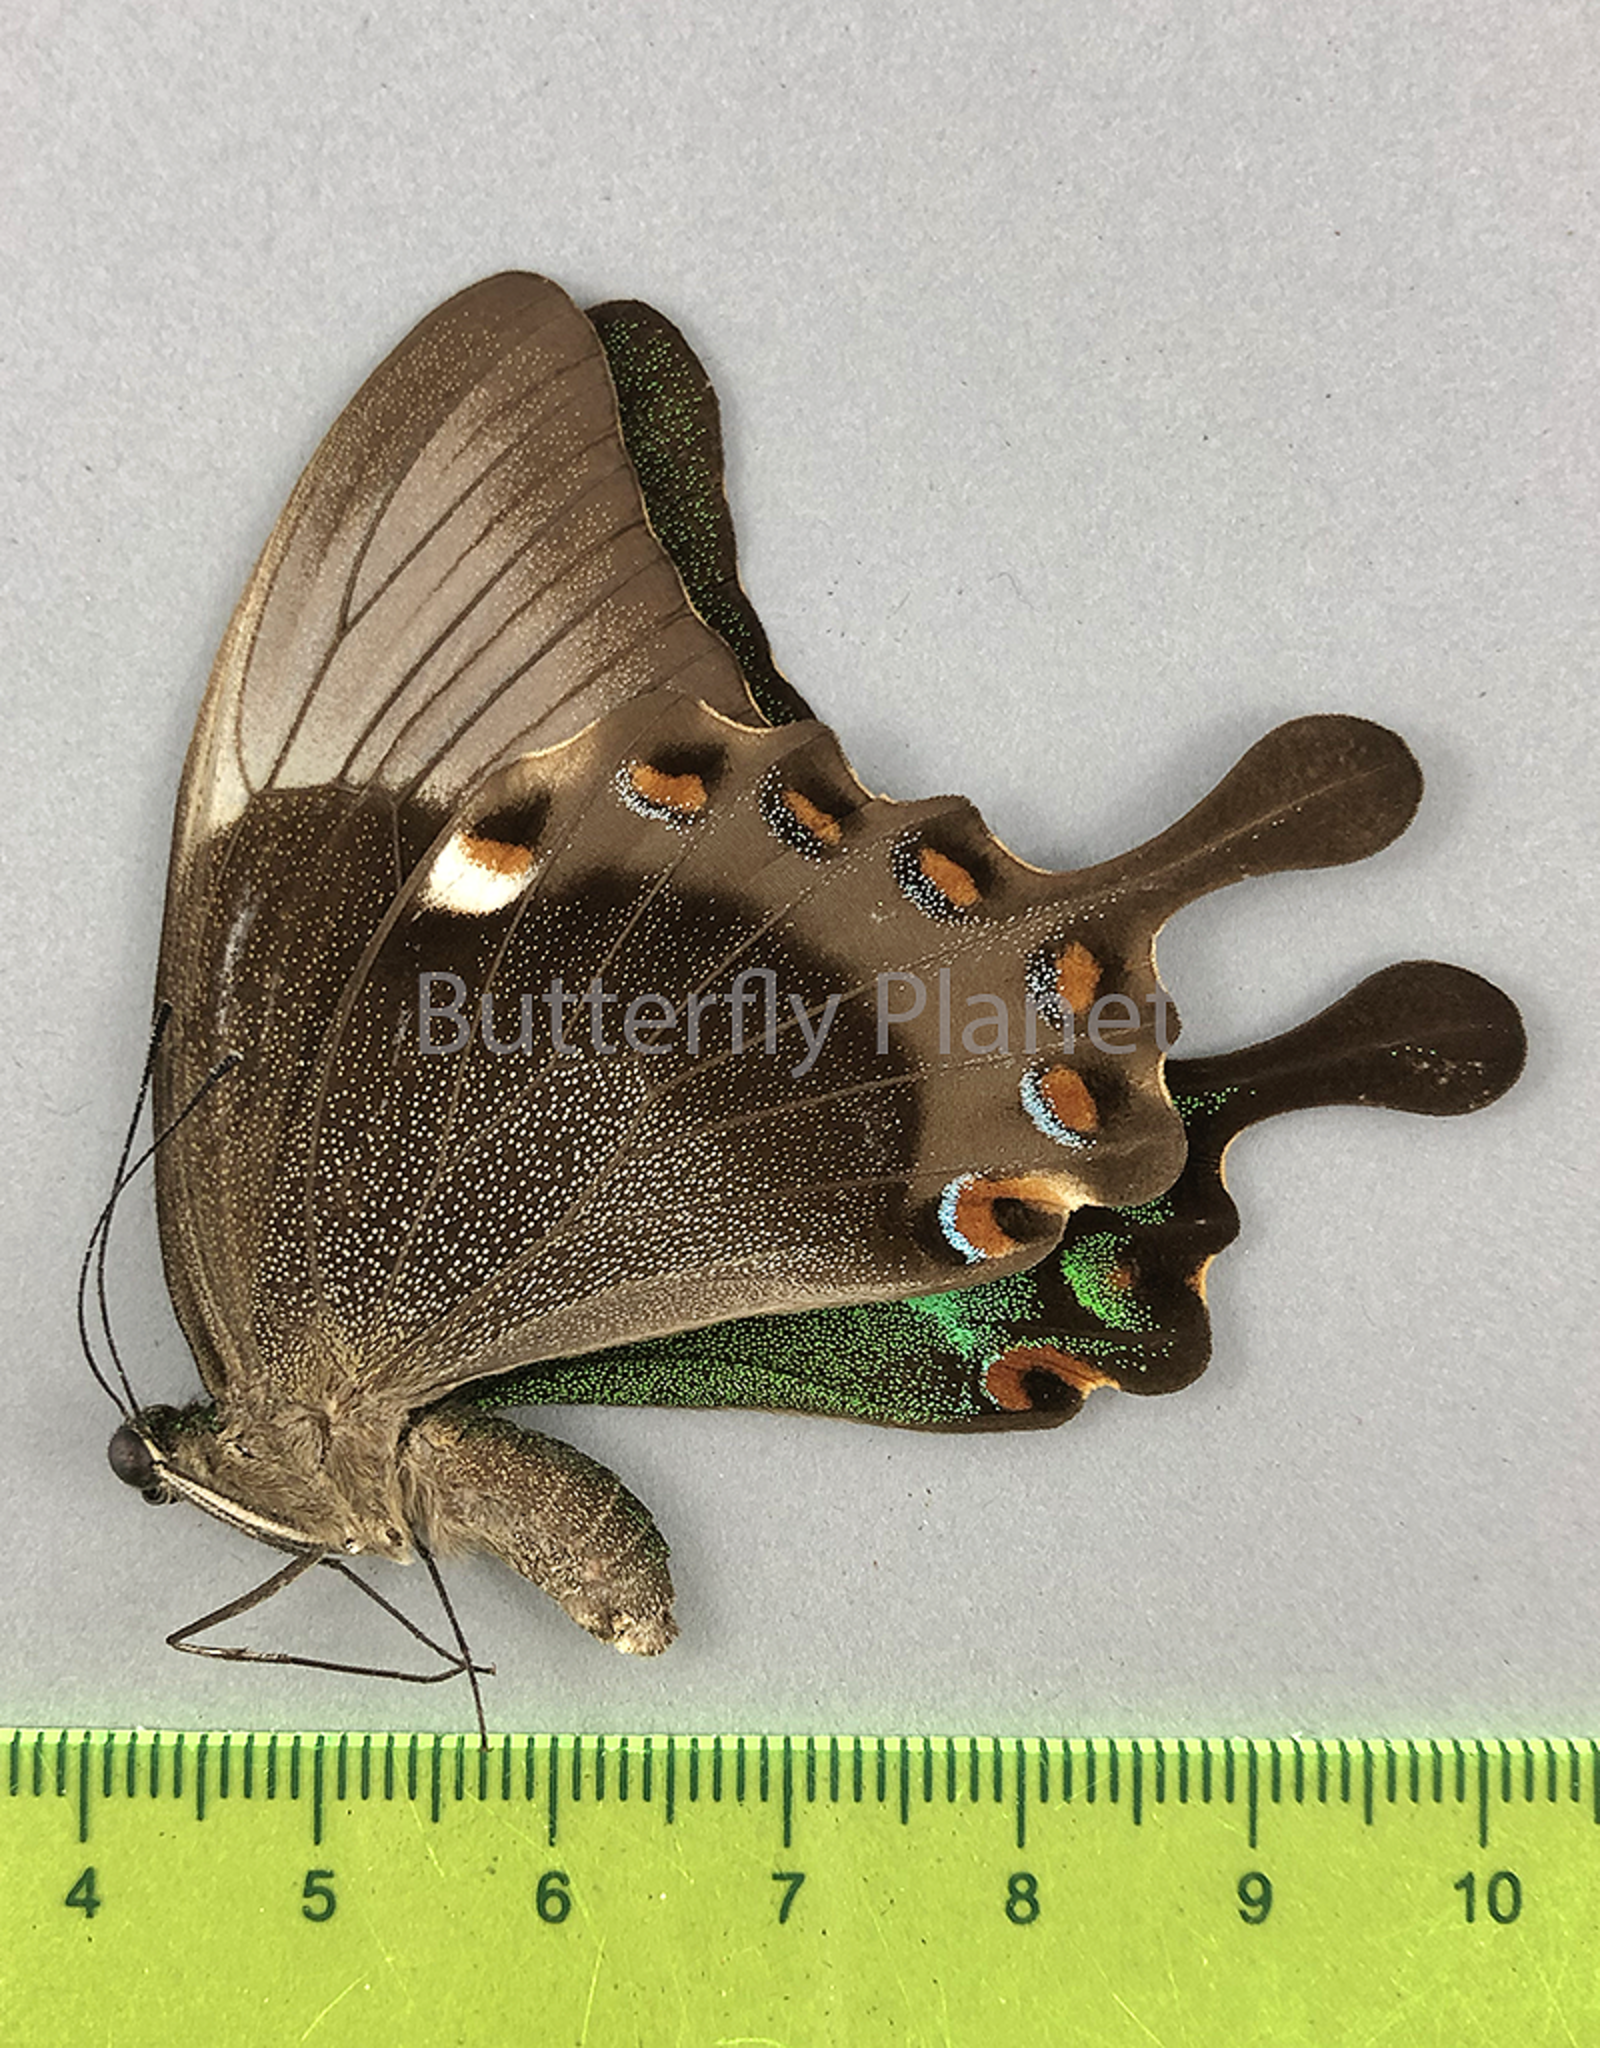 Papilio palinurus daedalus F A1 Marinduque, Phillipines